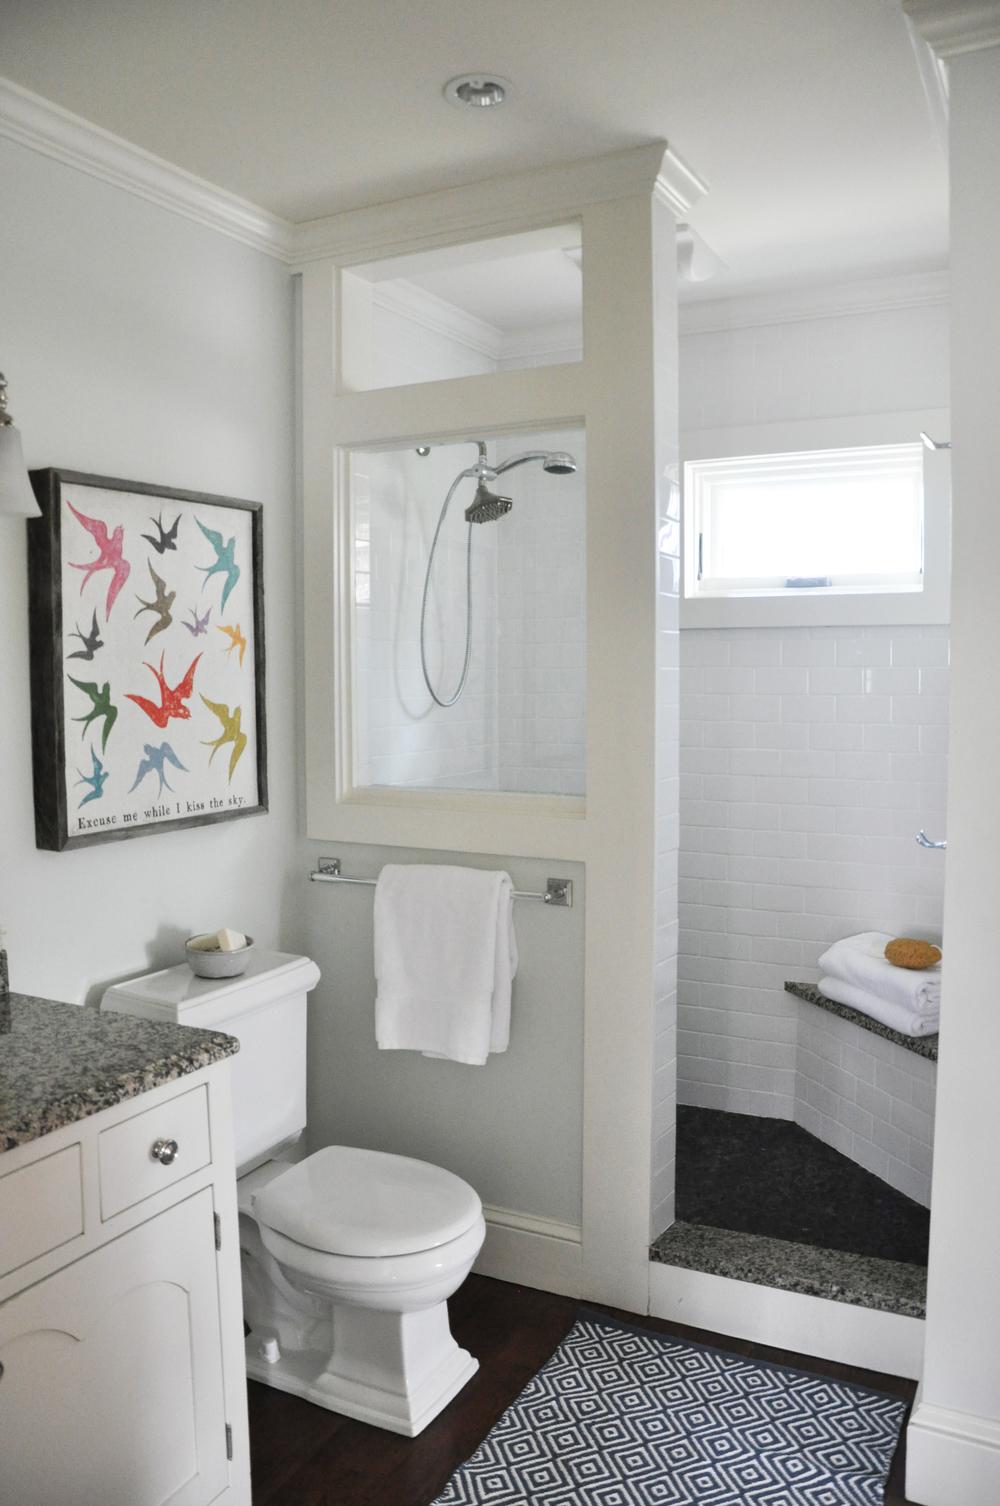 Diy Farmhouse Bathroom Remodel Plans For Sale Teaselwood Design